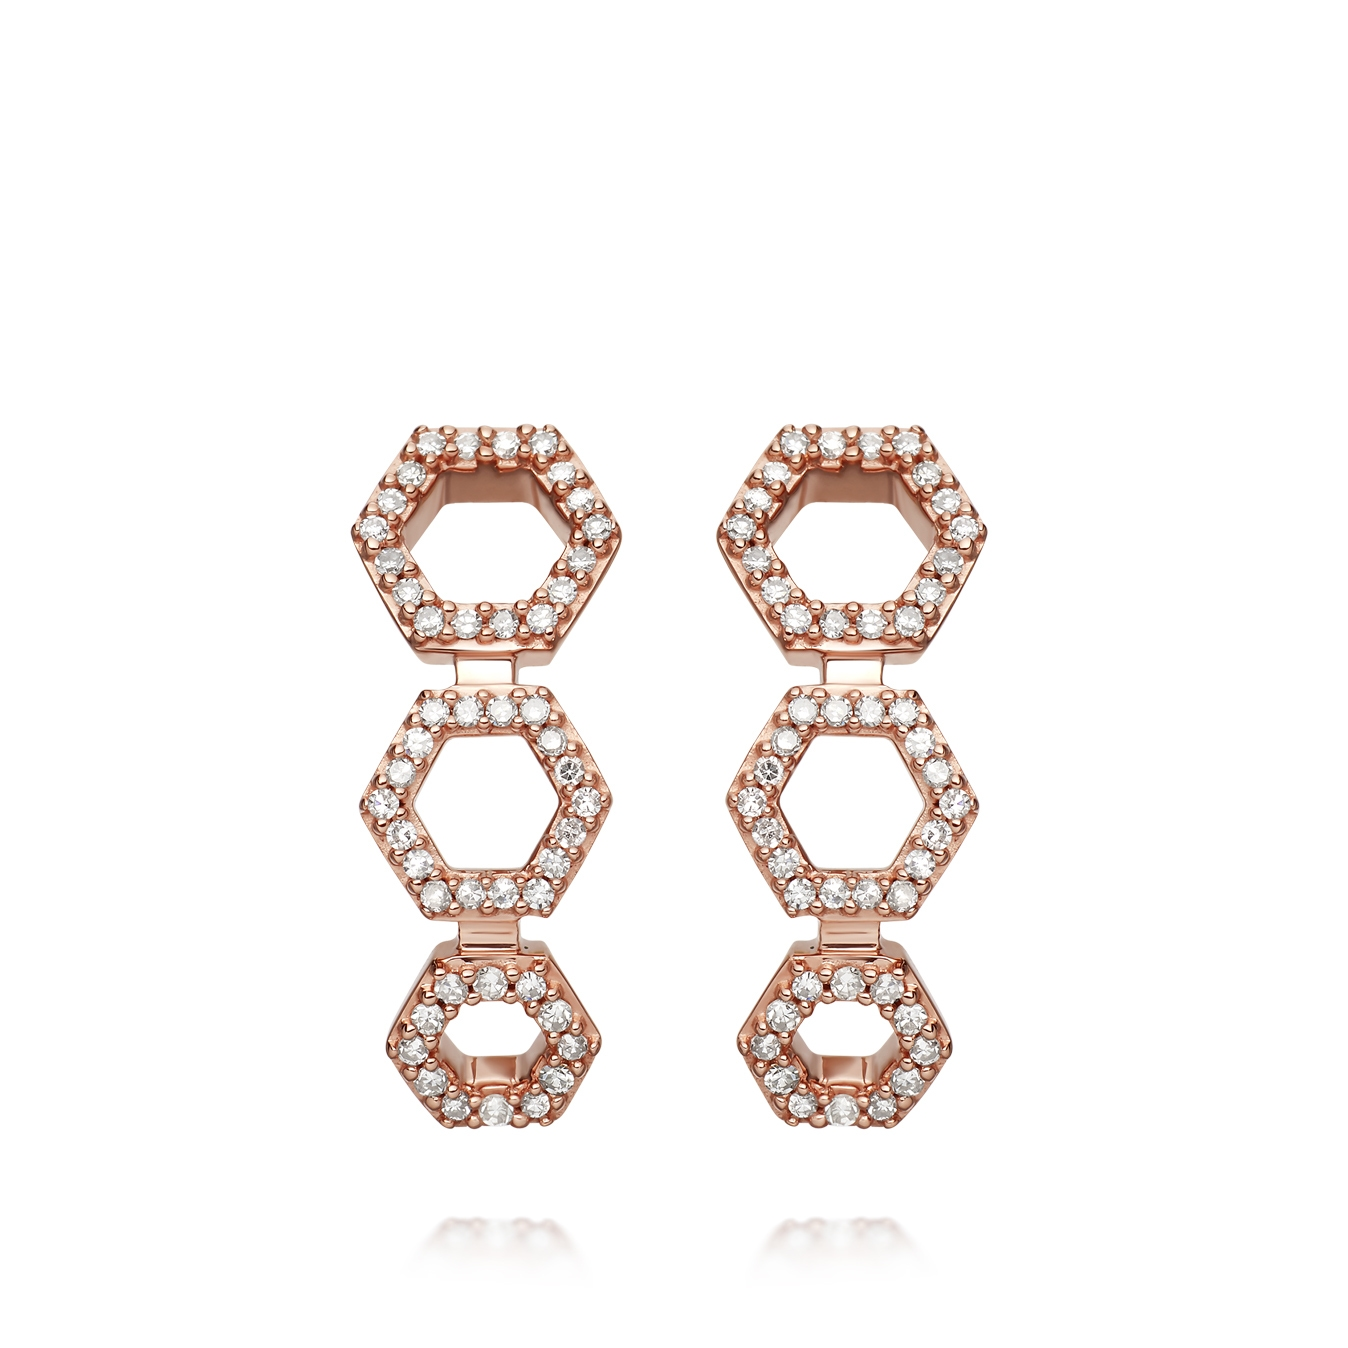 Triple Honeycomb Stud Earrings